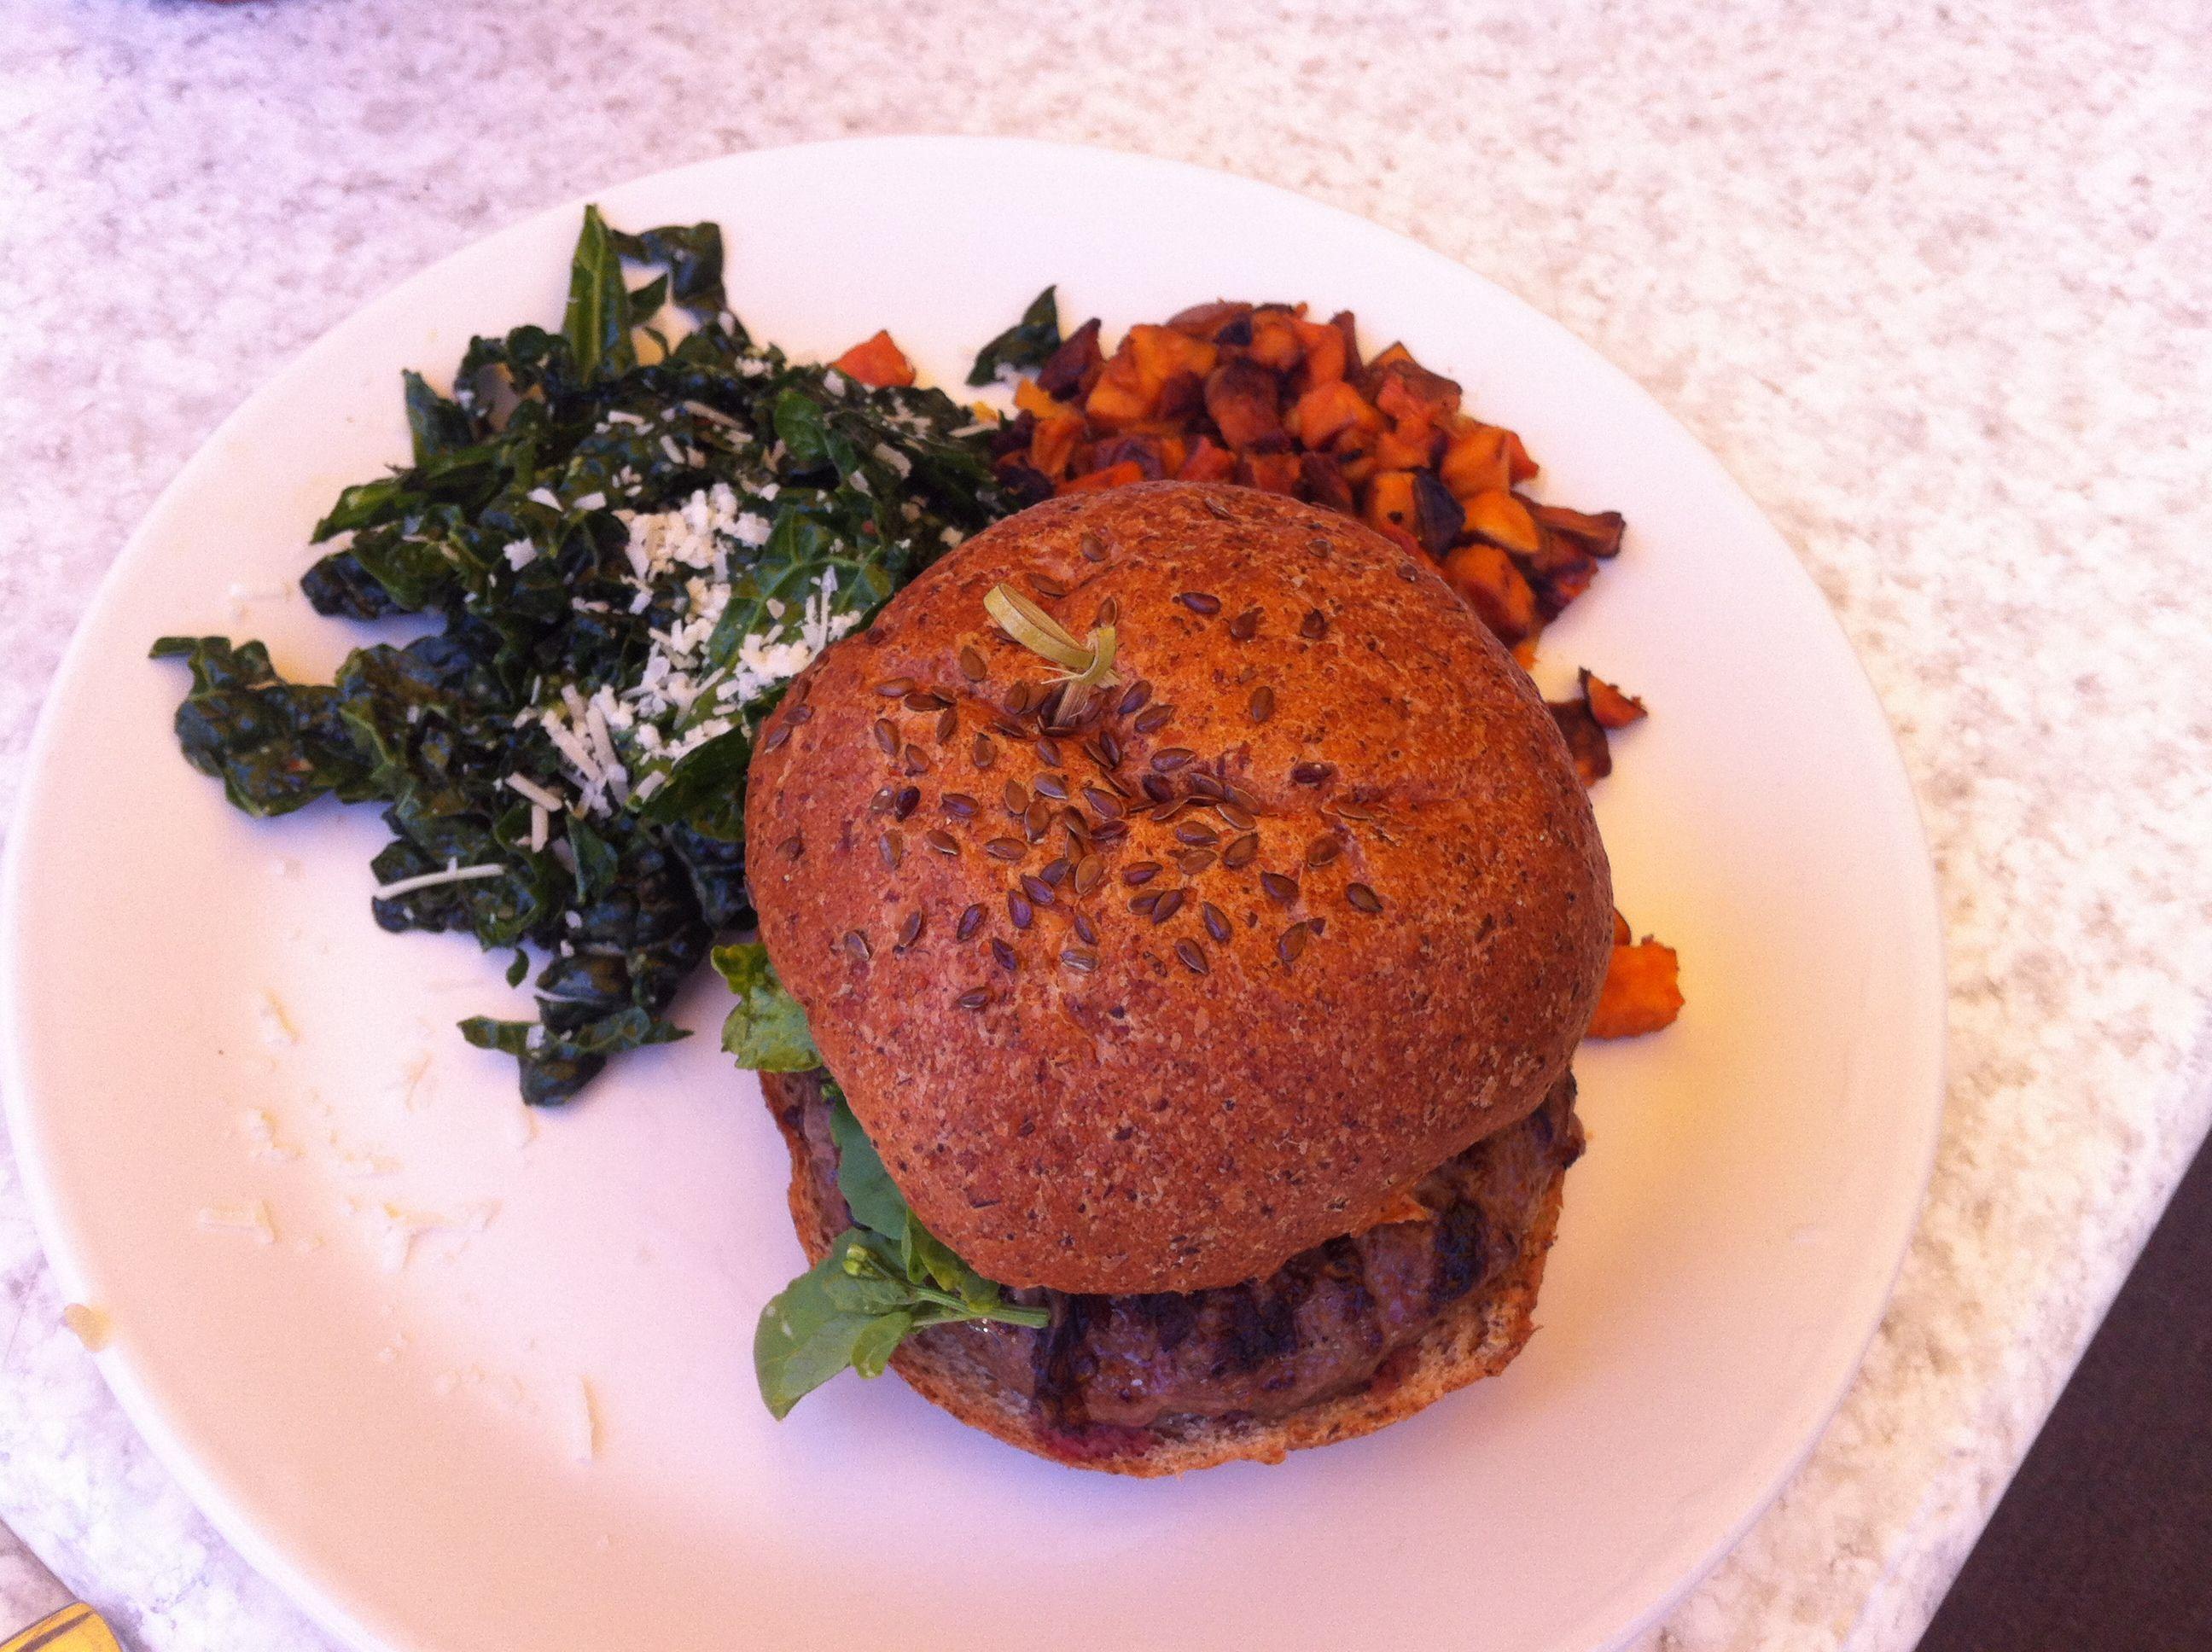 True Food Kitchen Burger The Burgertrue Food Kitchen Los Angeles  Los Angeles